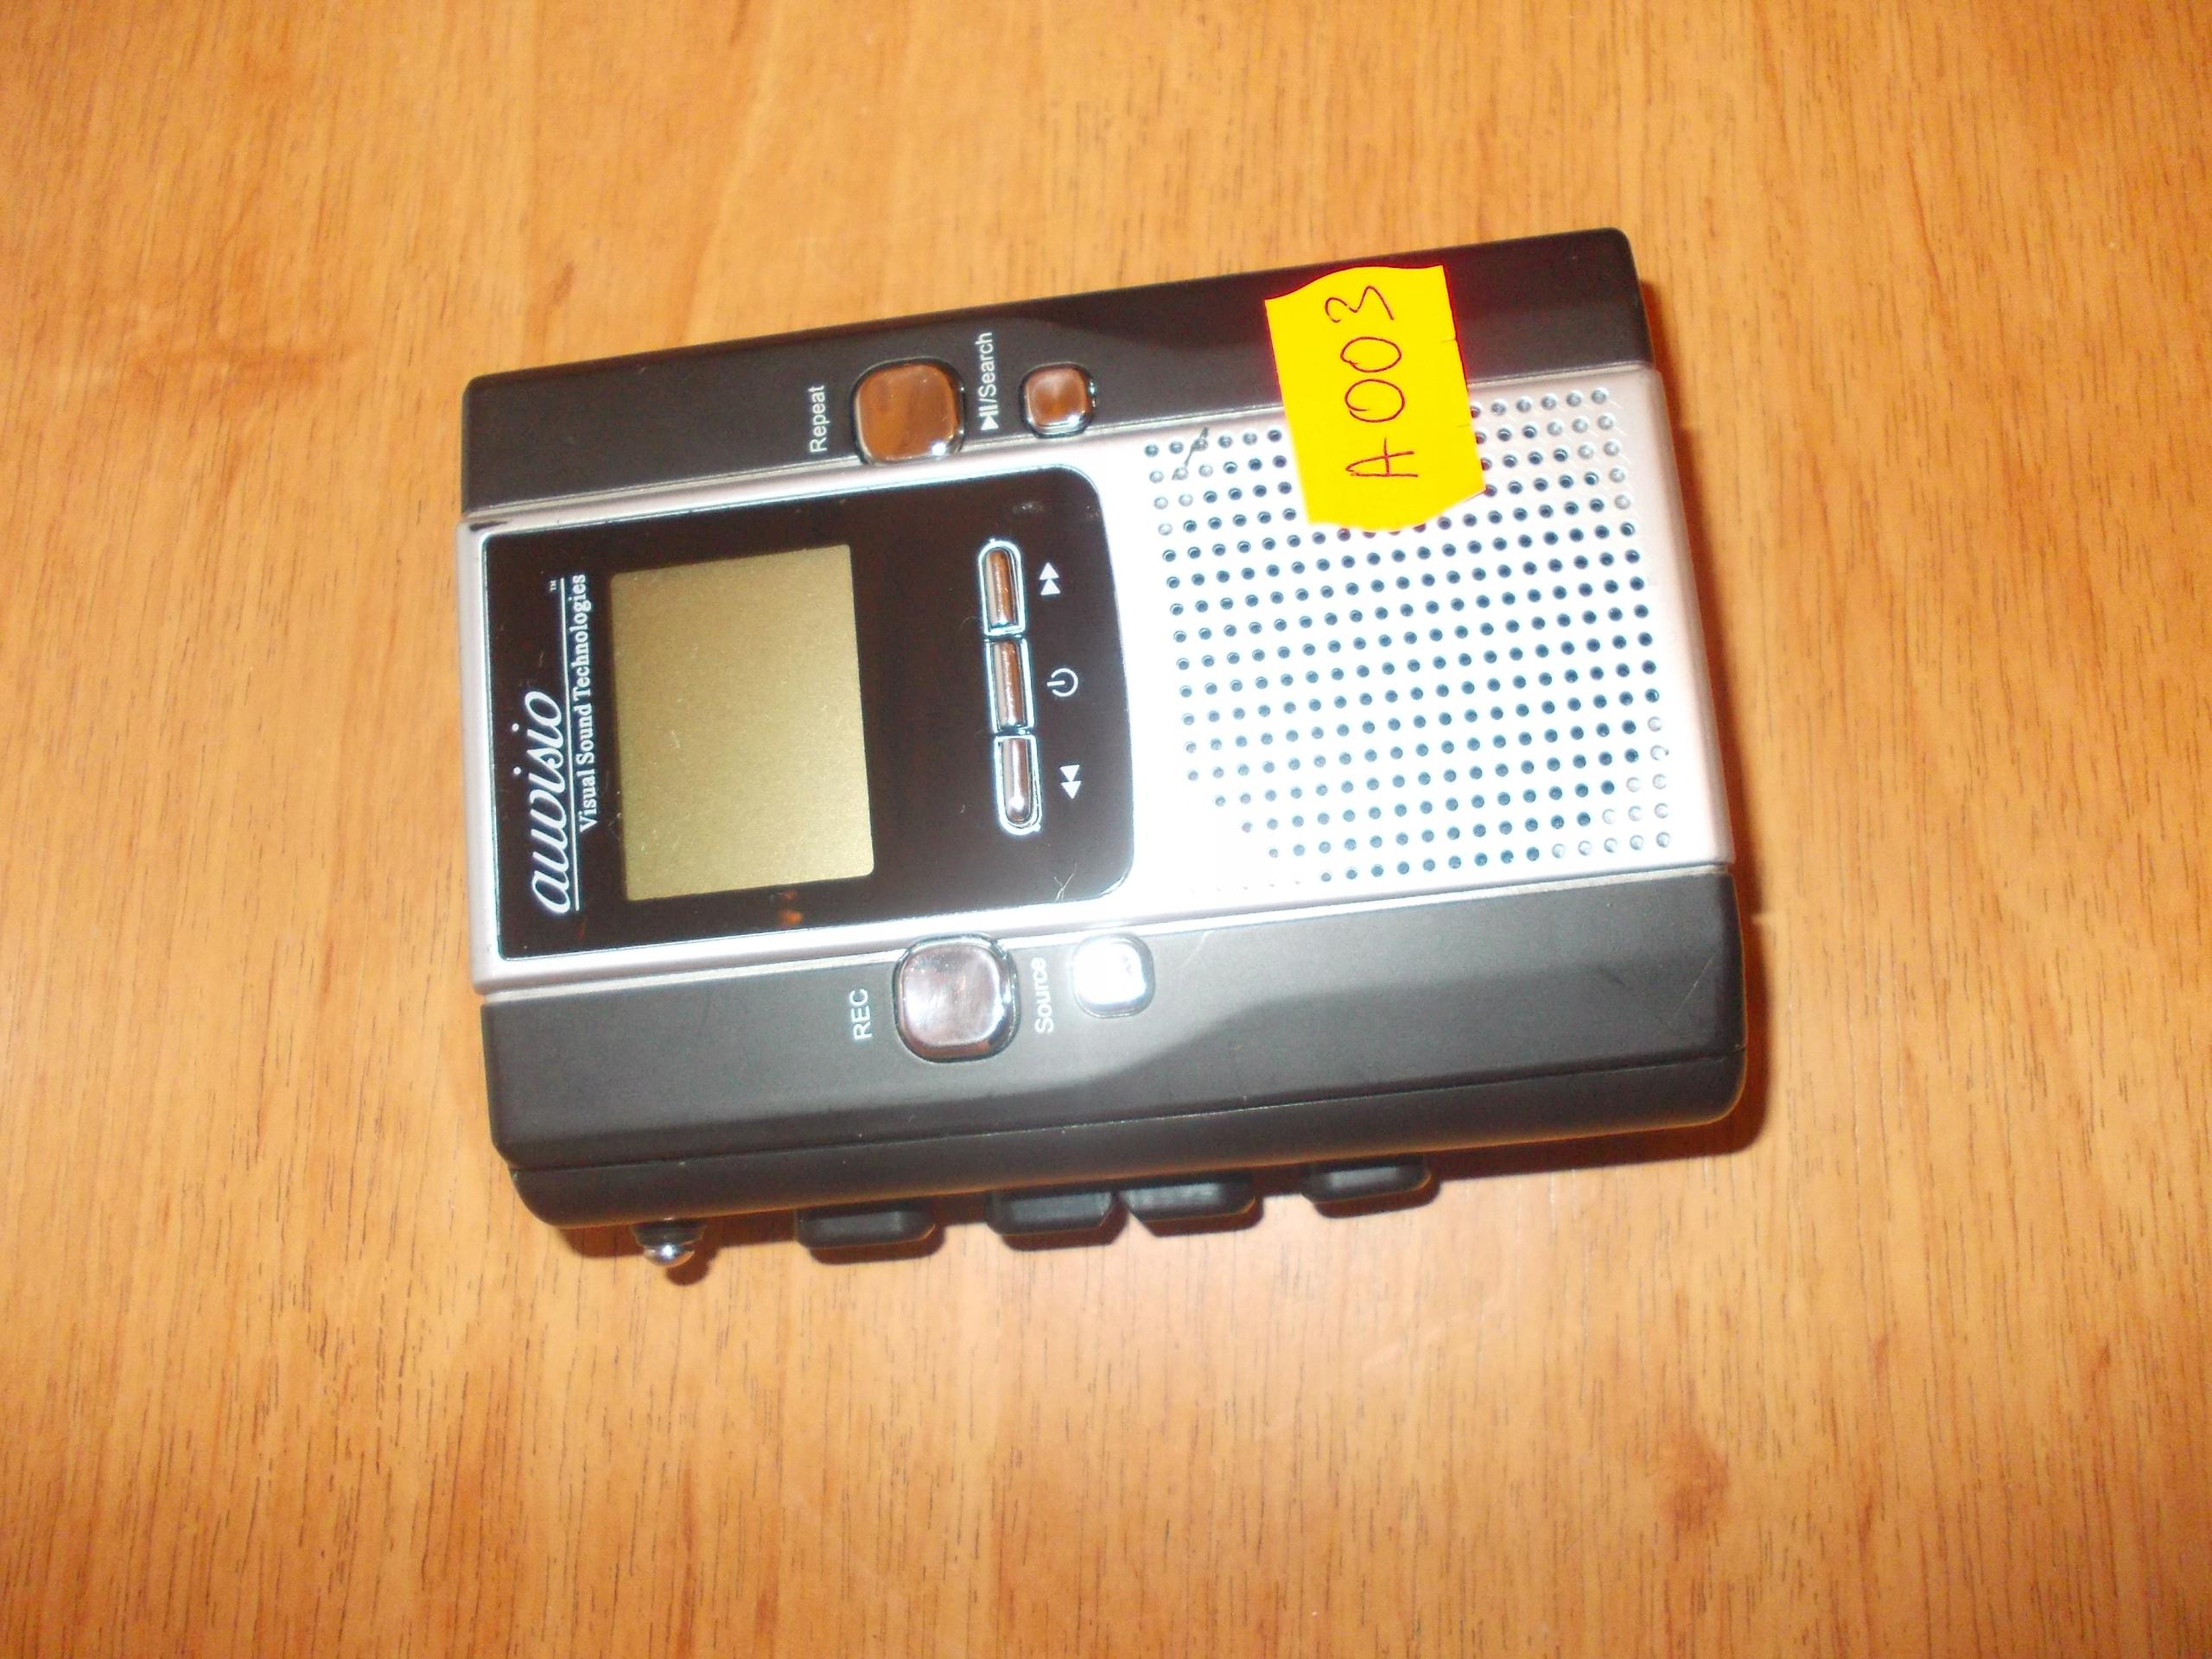 Radio walkman Auvisio model PX-1406-675 A003